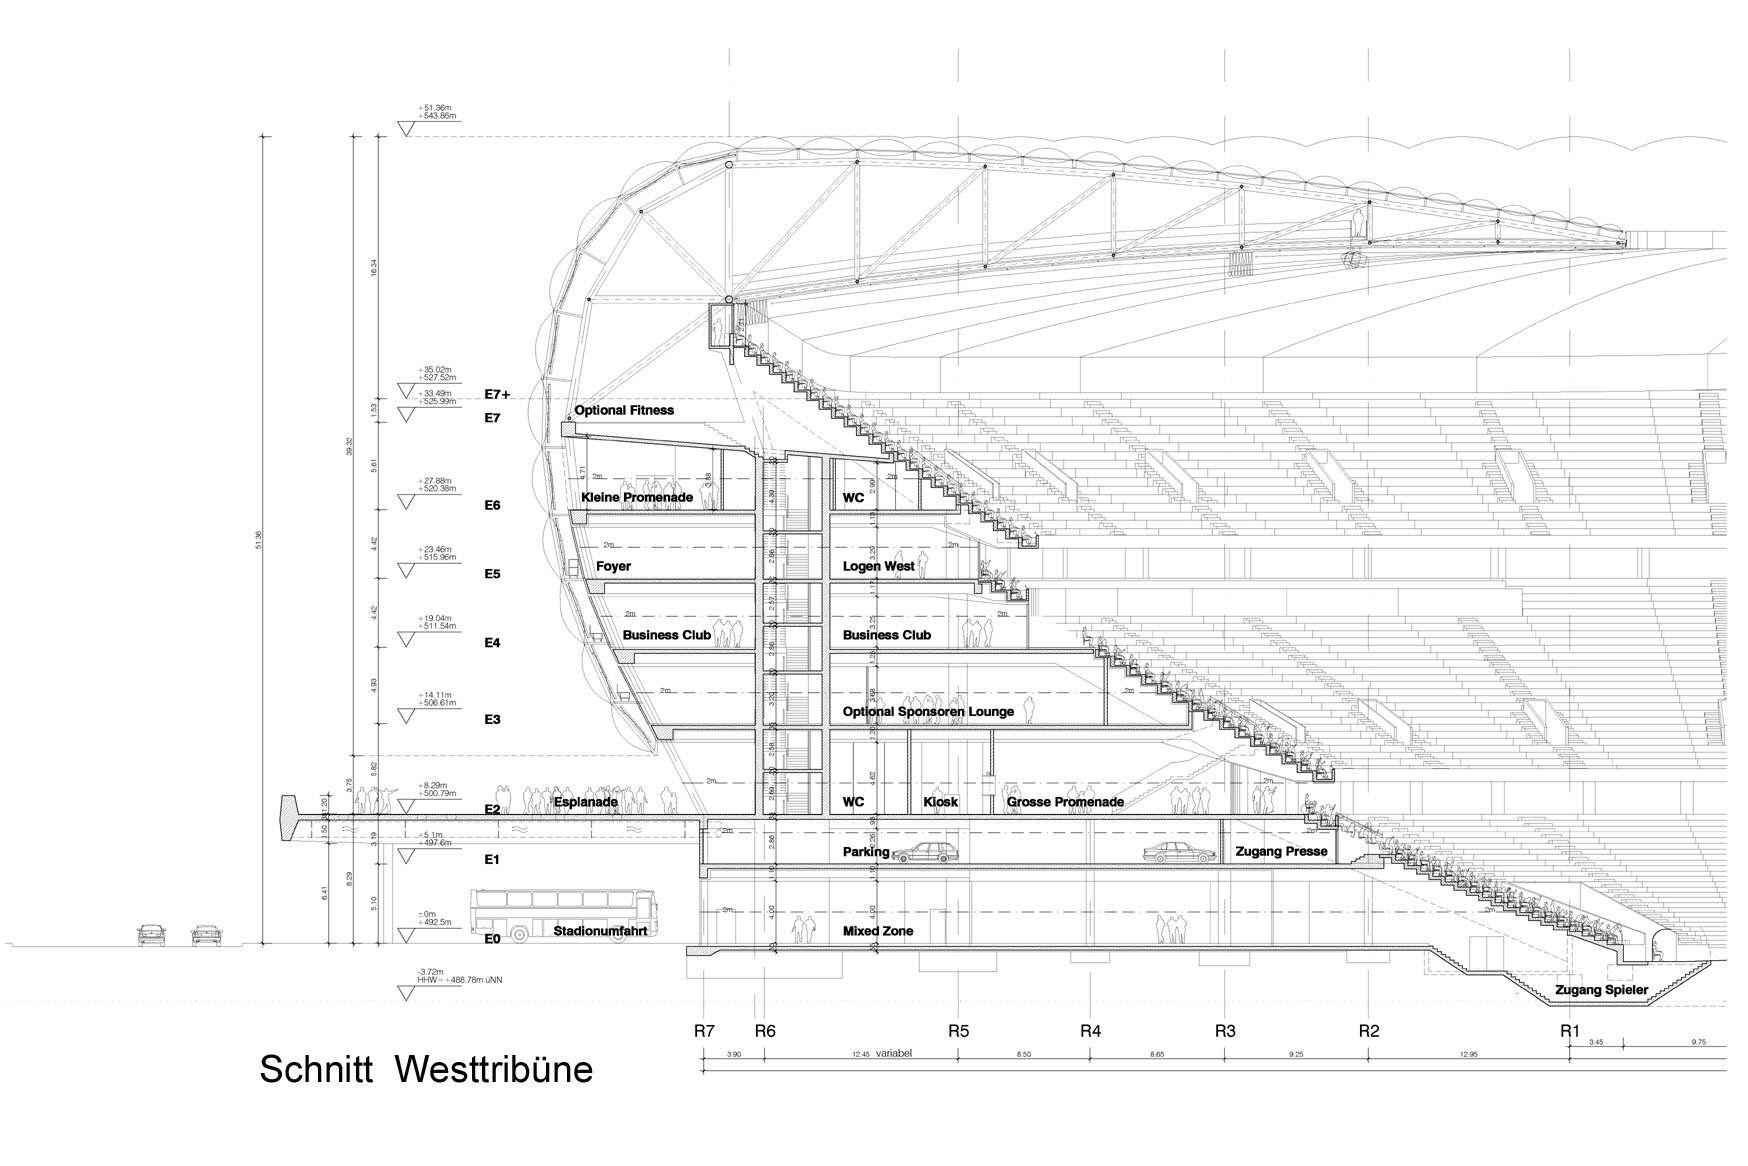 Allianz Arena Stadium Section